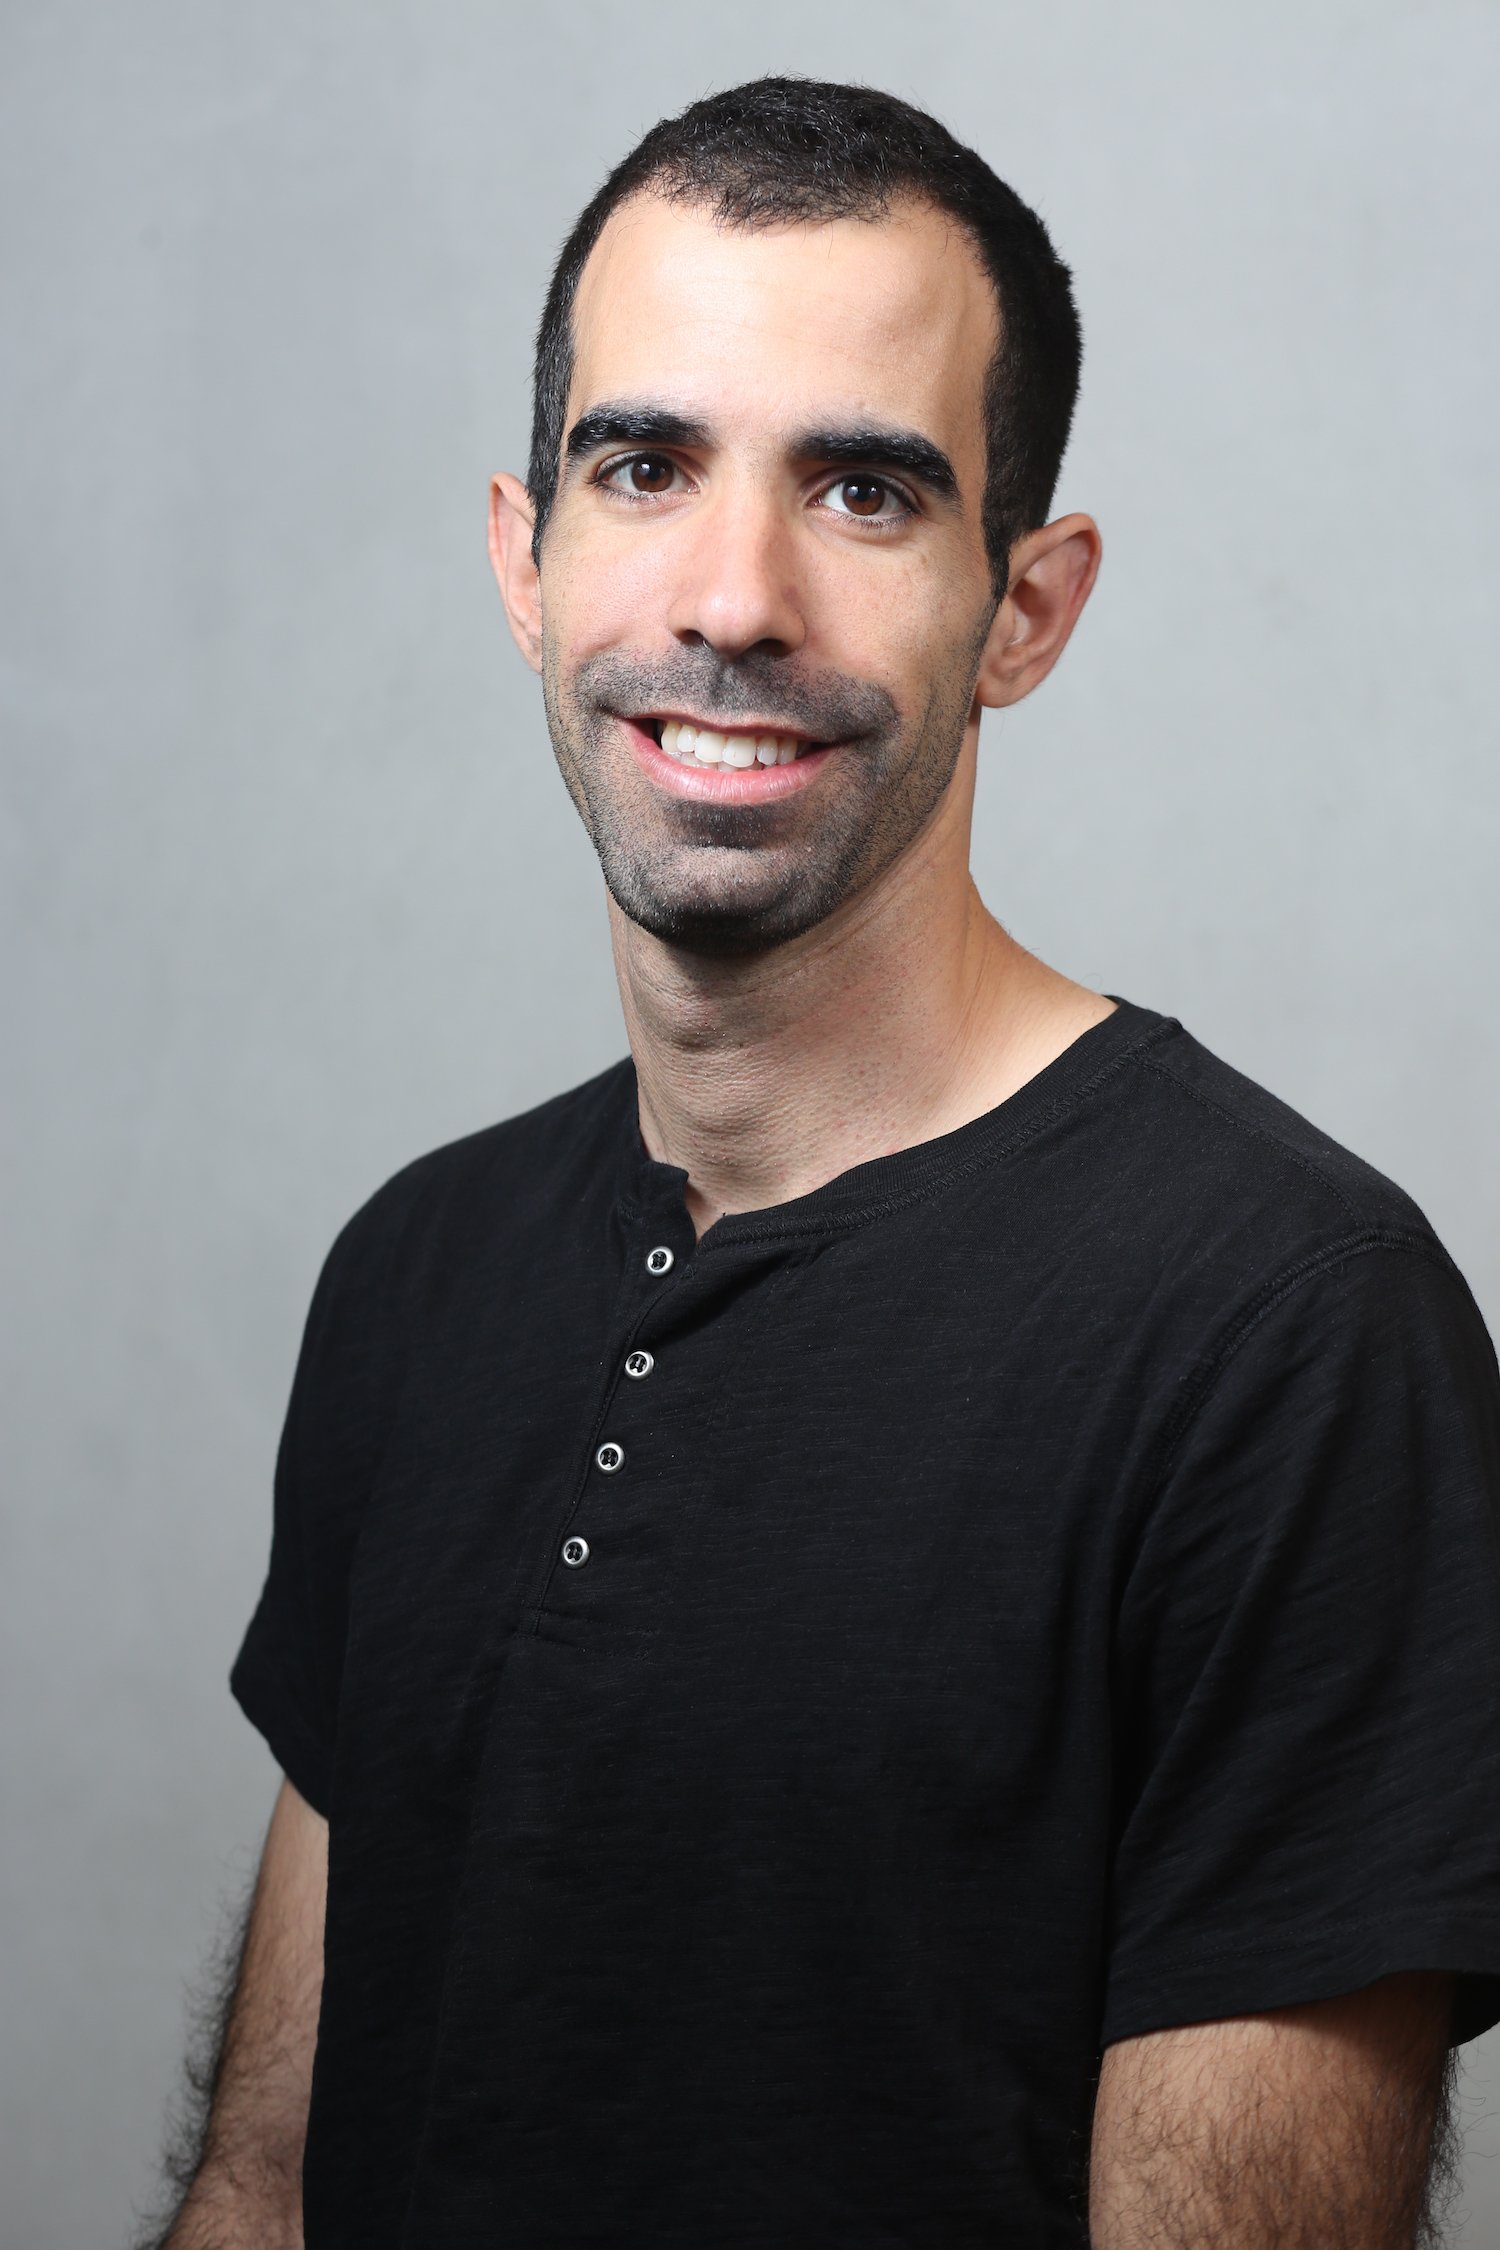 Amir Preminger